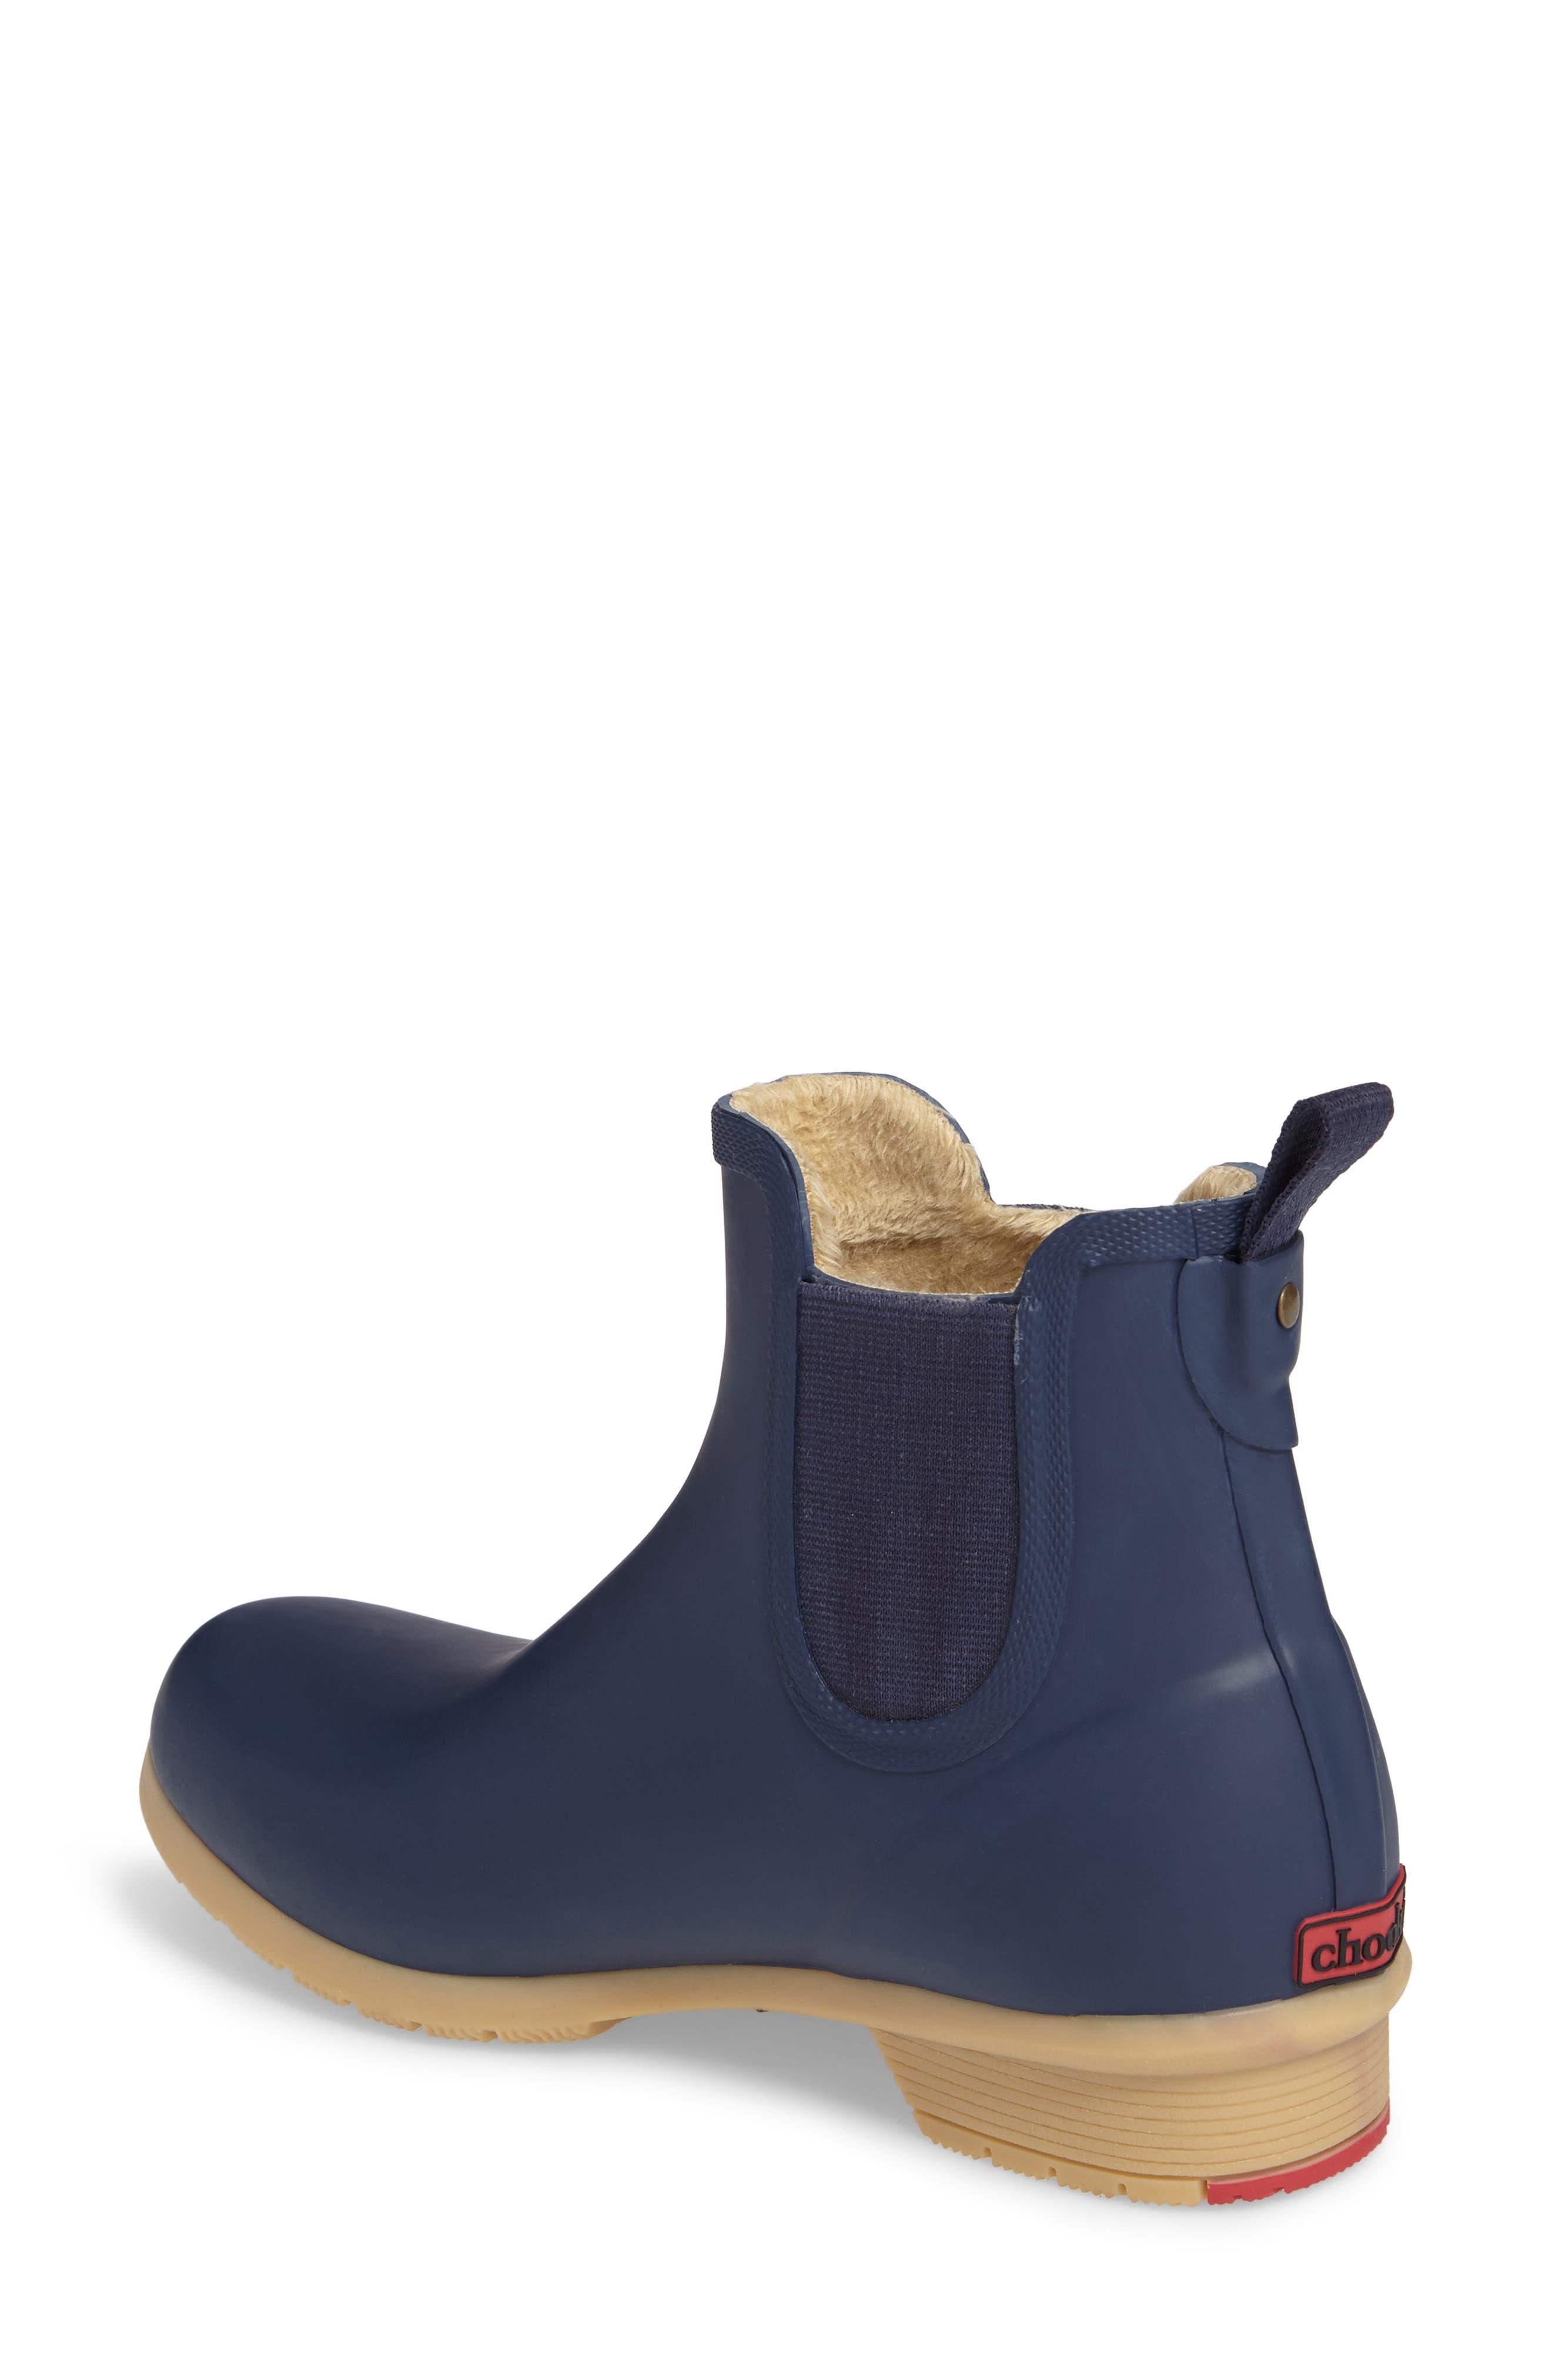 CHOOKA, Bainbridge Chelsea Rain Boot, Alternate thumbnail 2, color, NAVY